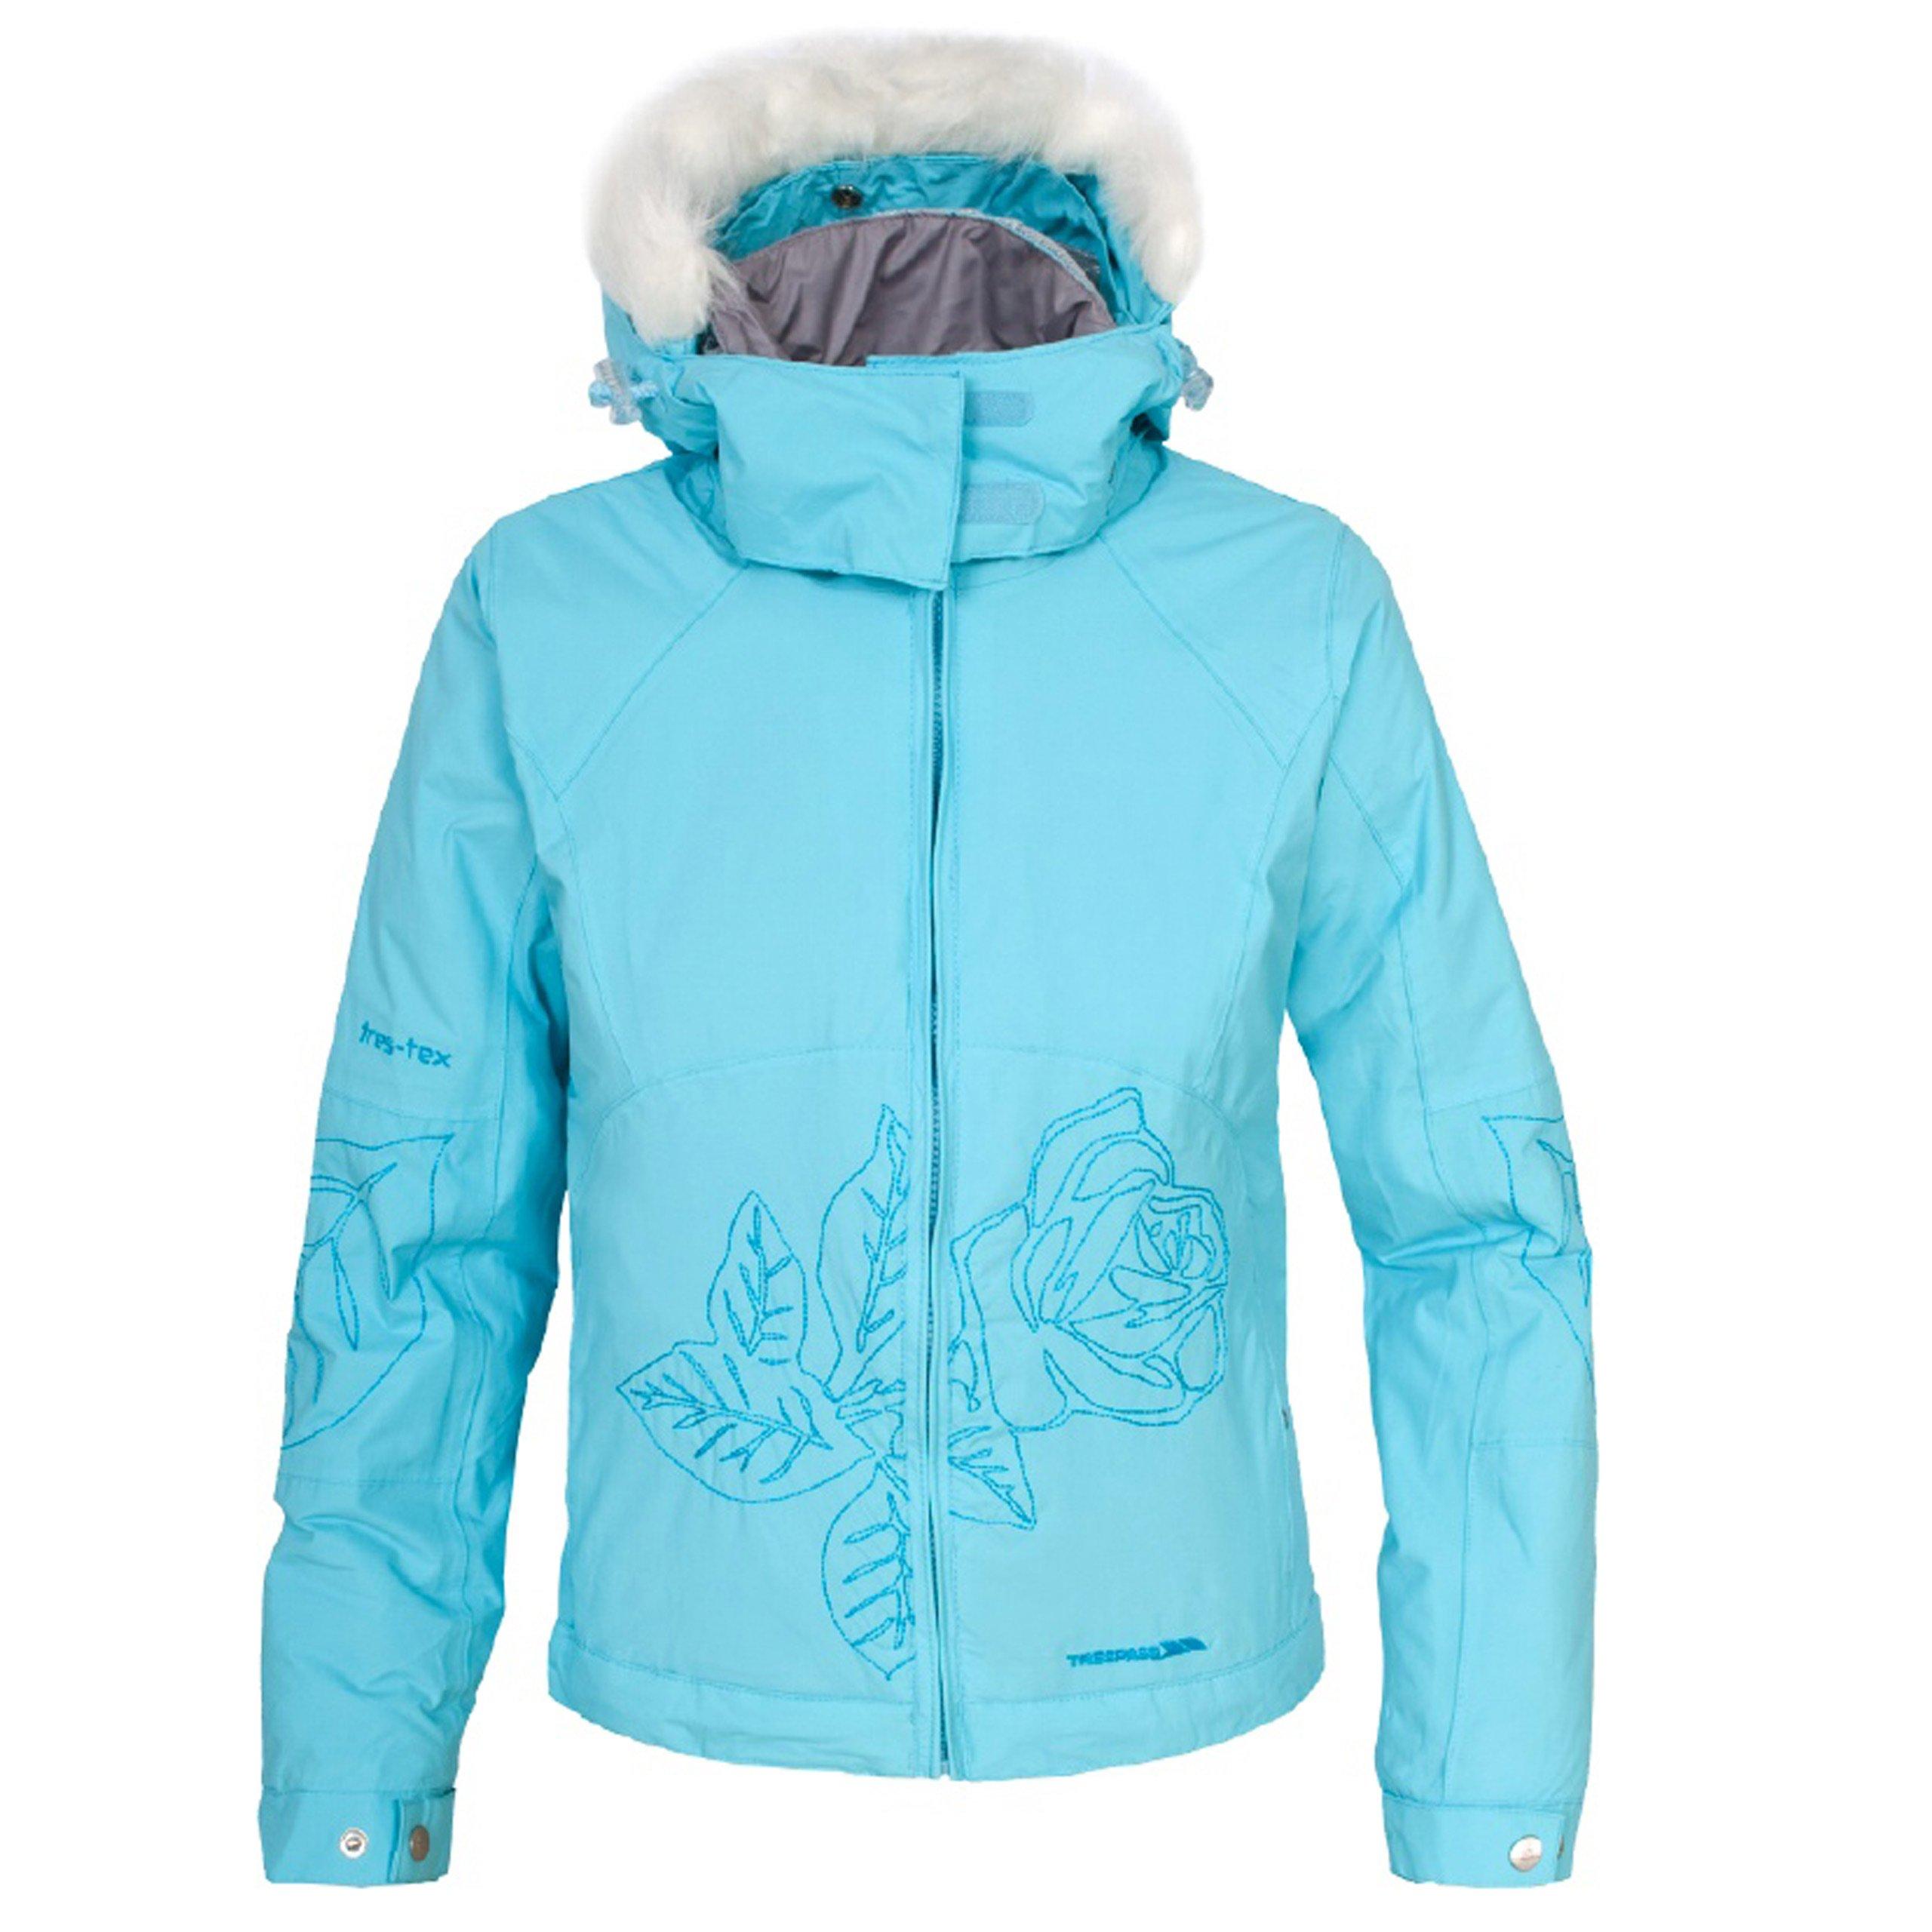 MIMOSA Girl's (Youth) Ski Jacket POOL BLUE 16Y